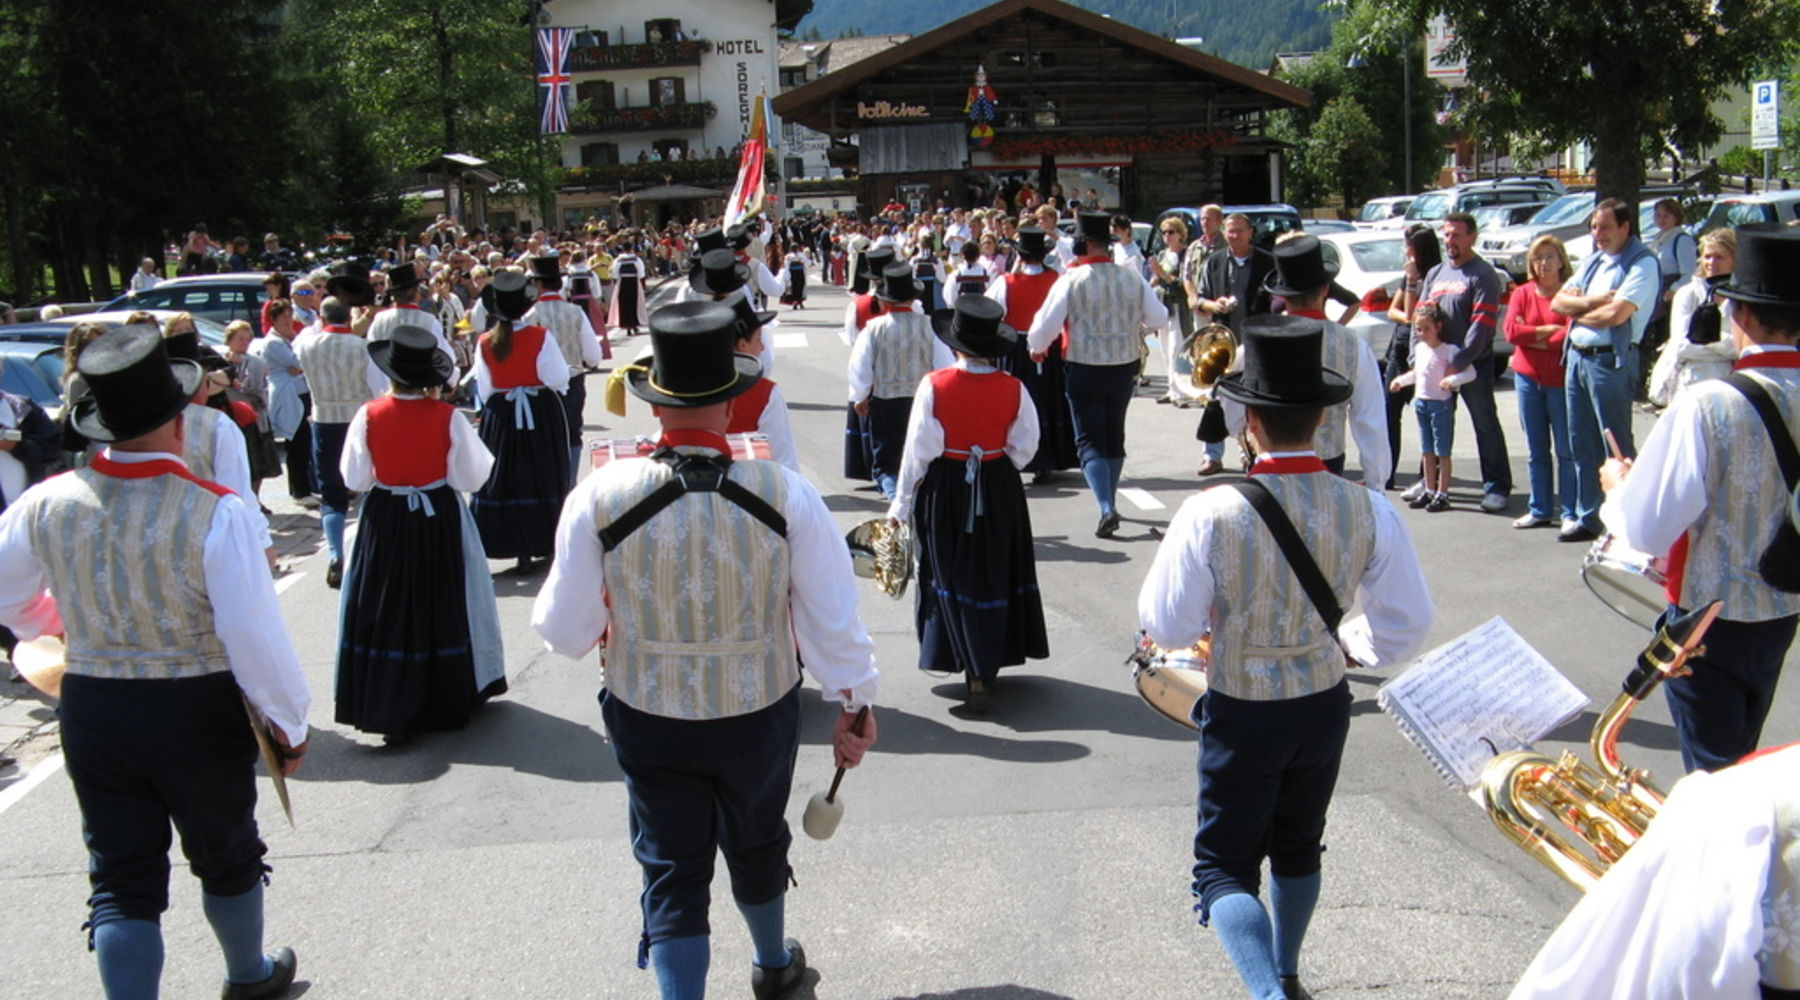 Sfilata alla Gran Festa d'ista'